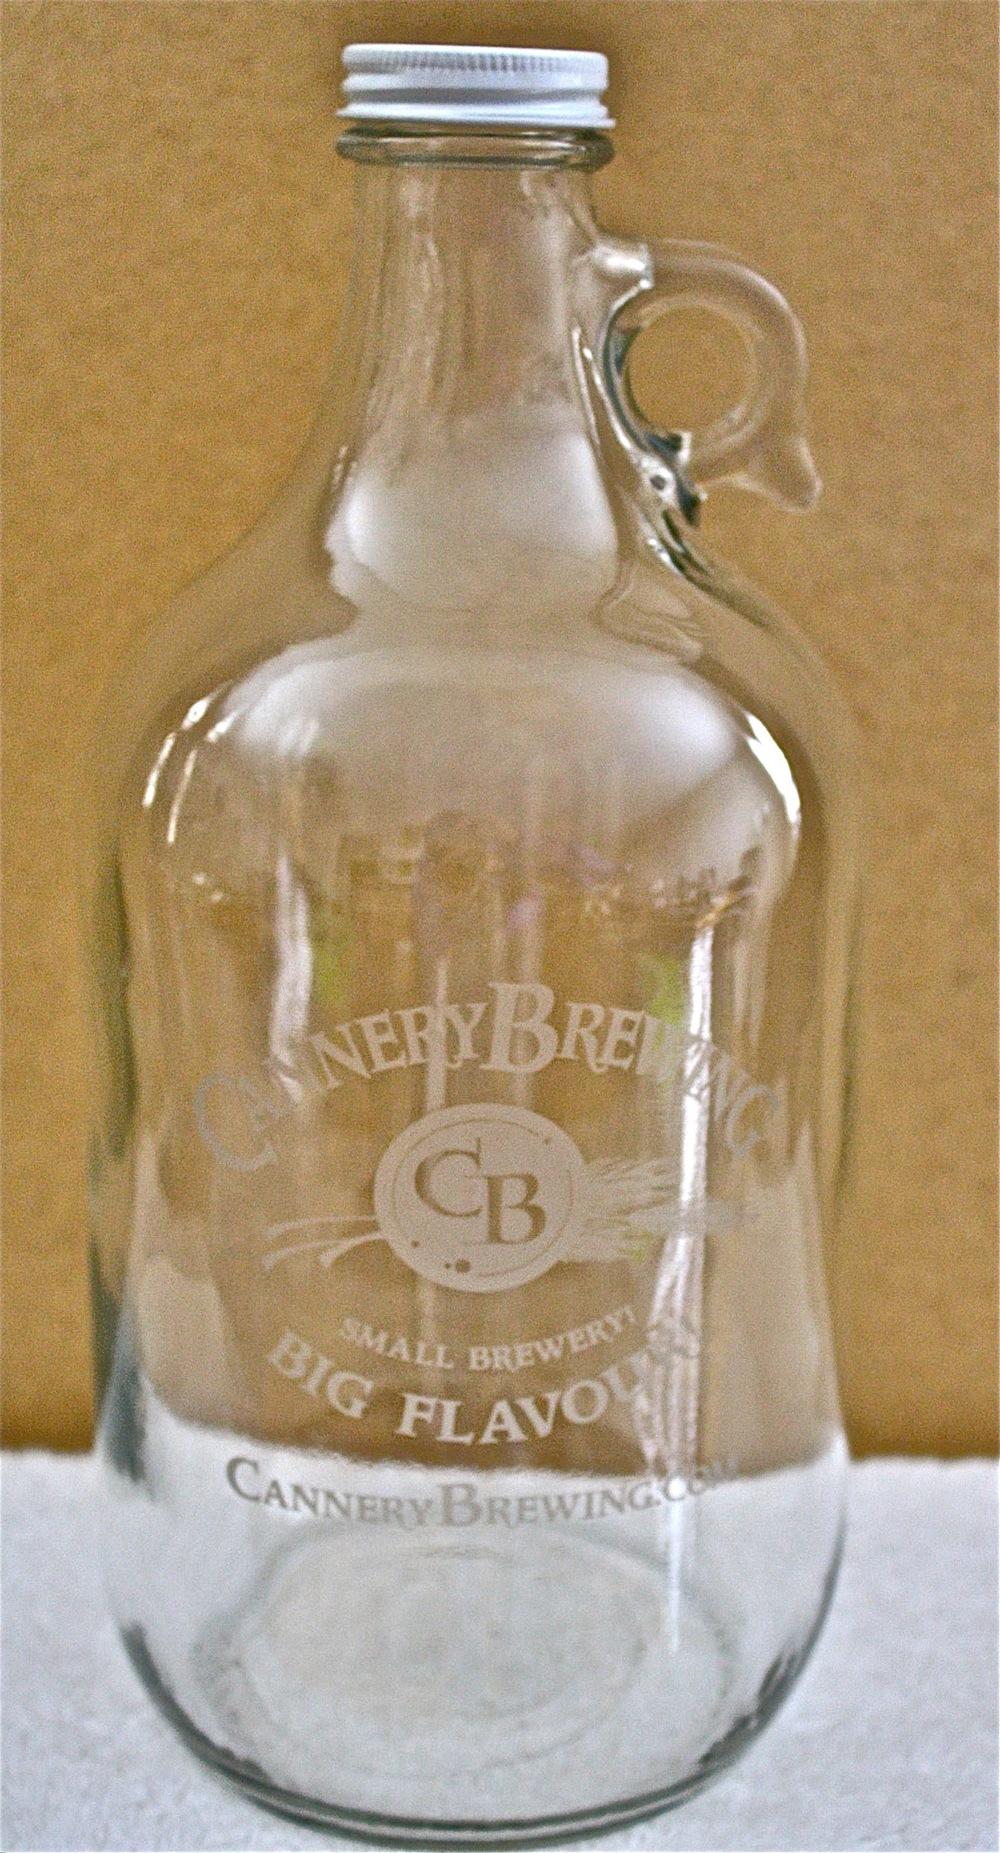 GR - Cannery Brewing.jpg